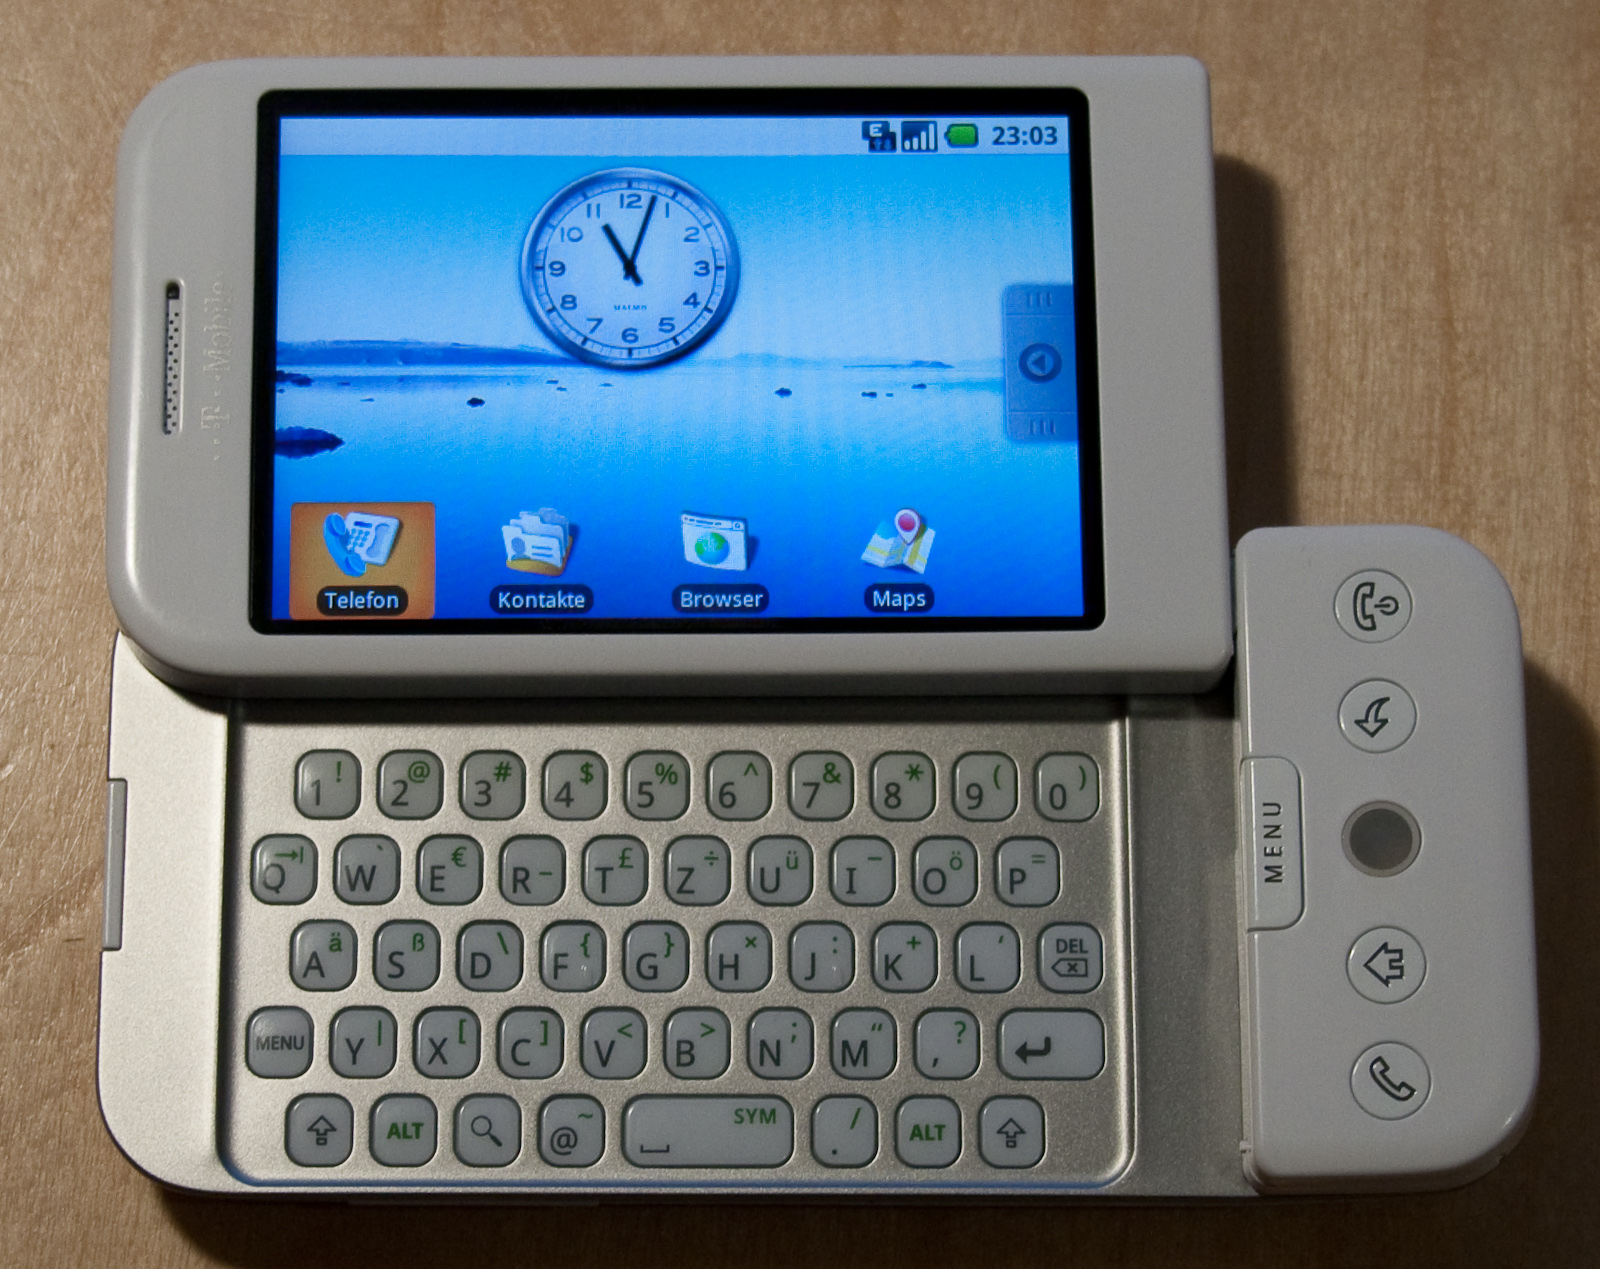 HTC_Dreamg1jpg